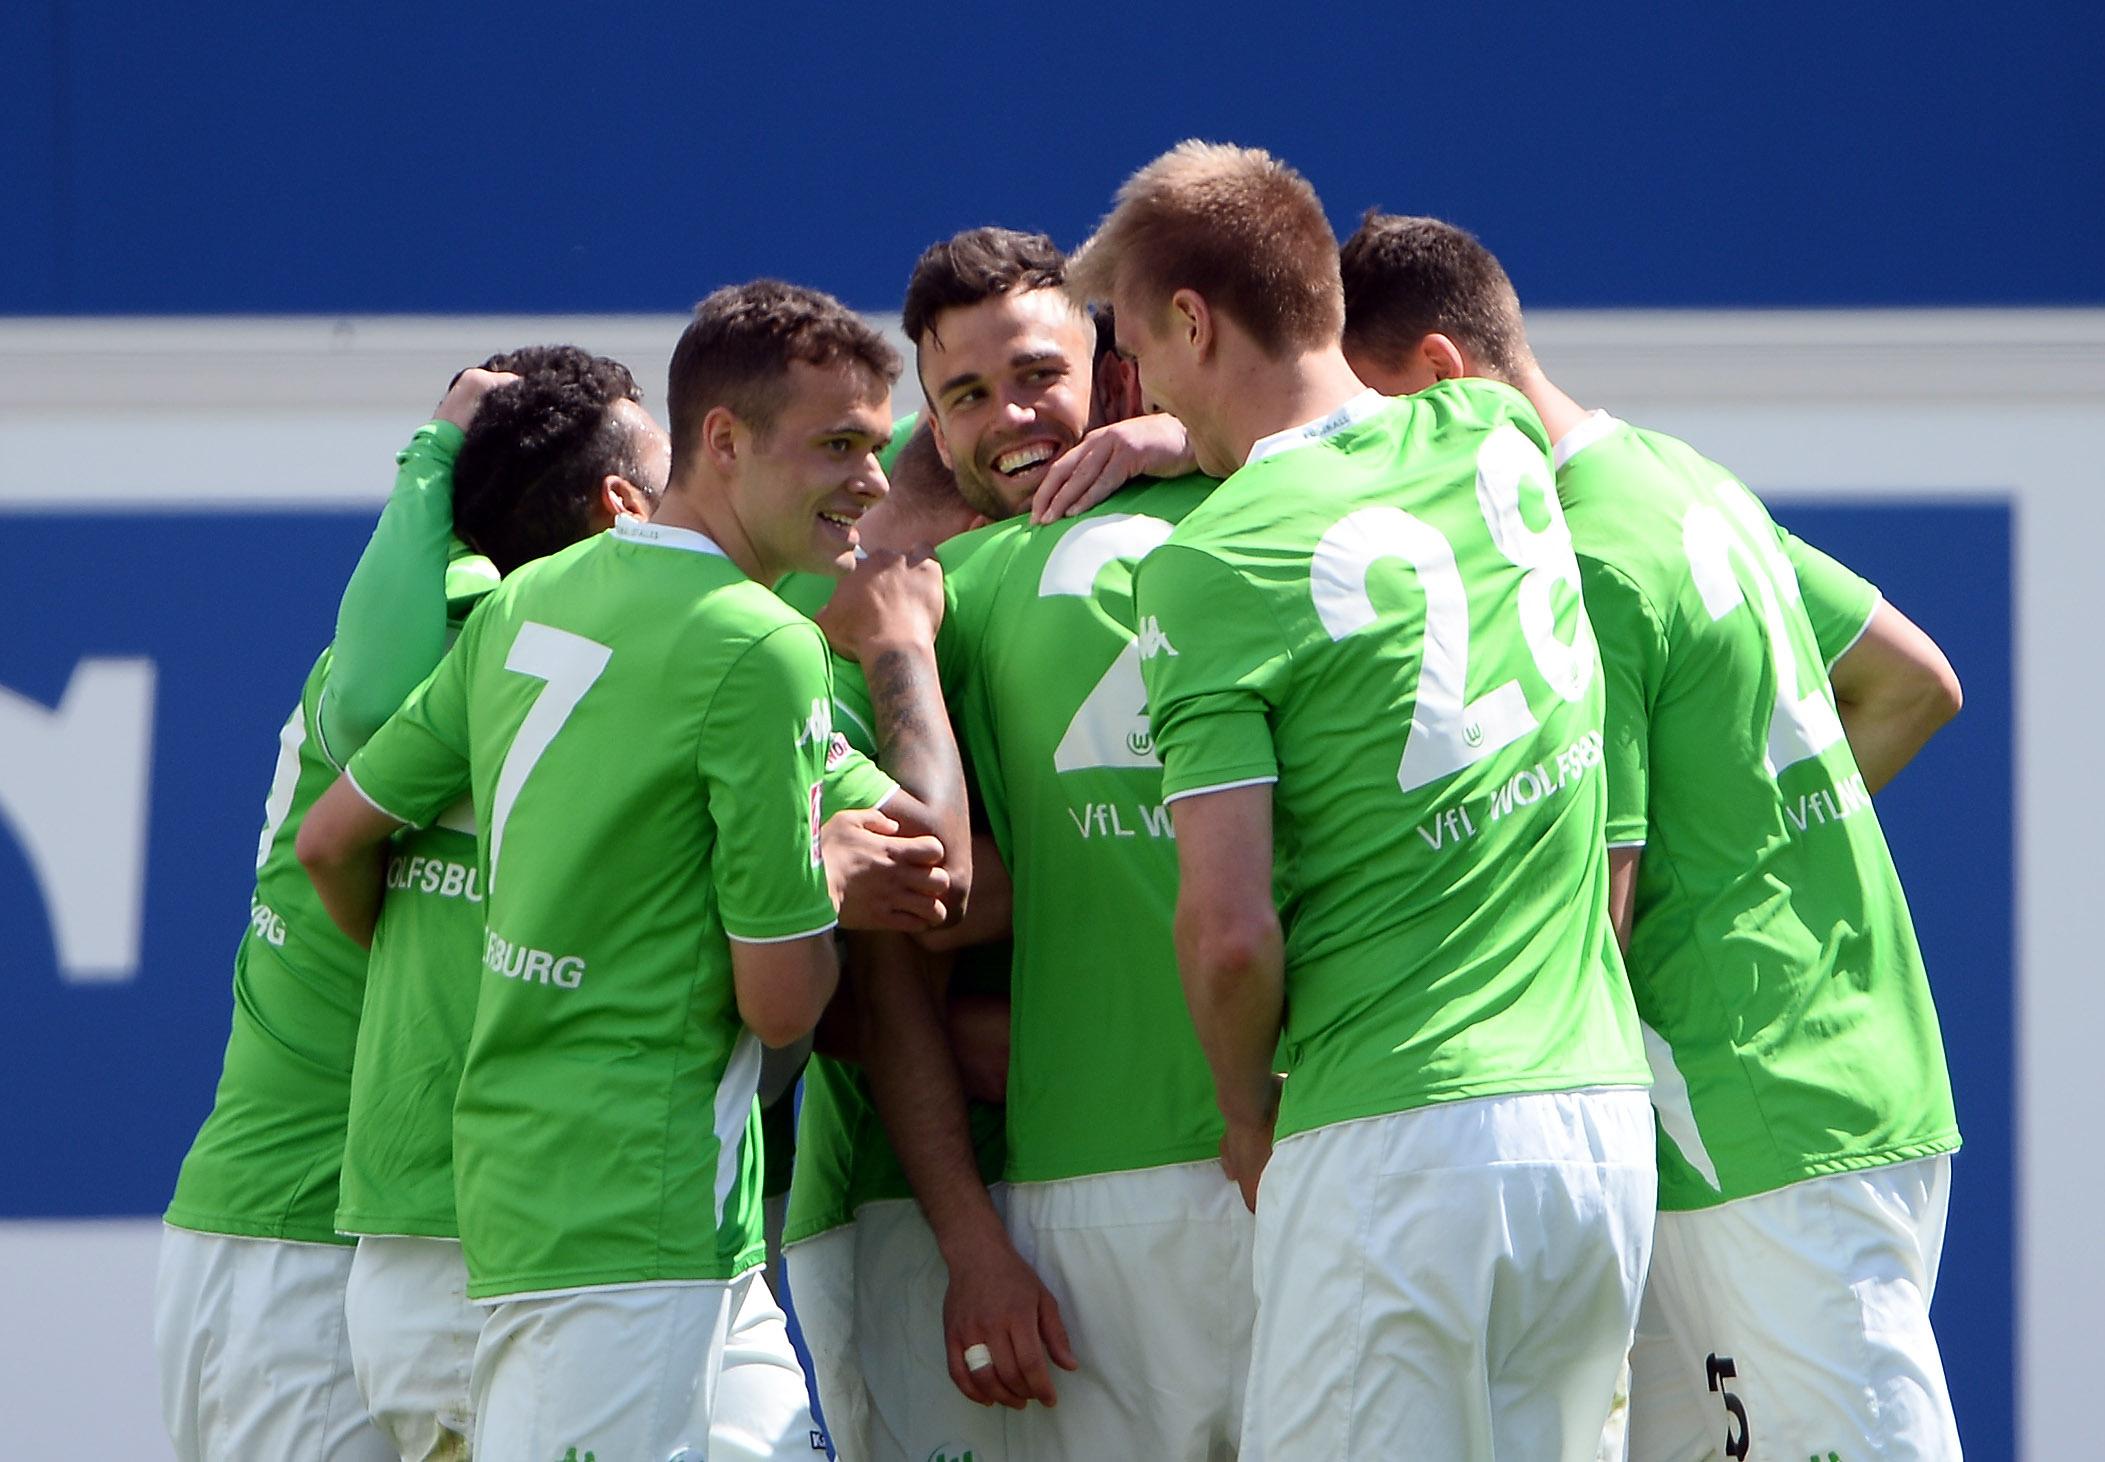 FUSSBALL - Wolfsburg vs Bremen, RL Nord